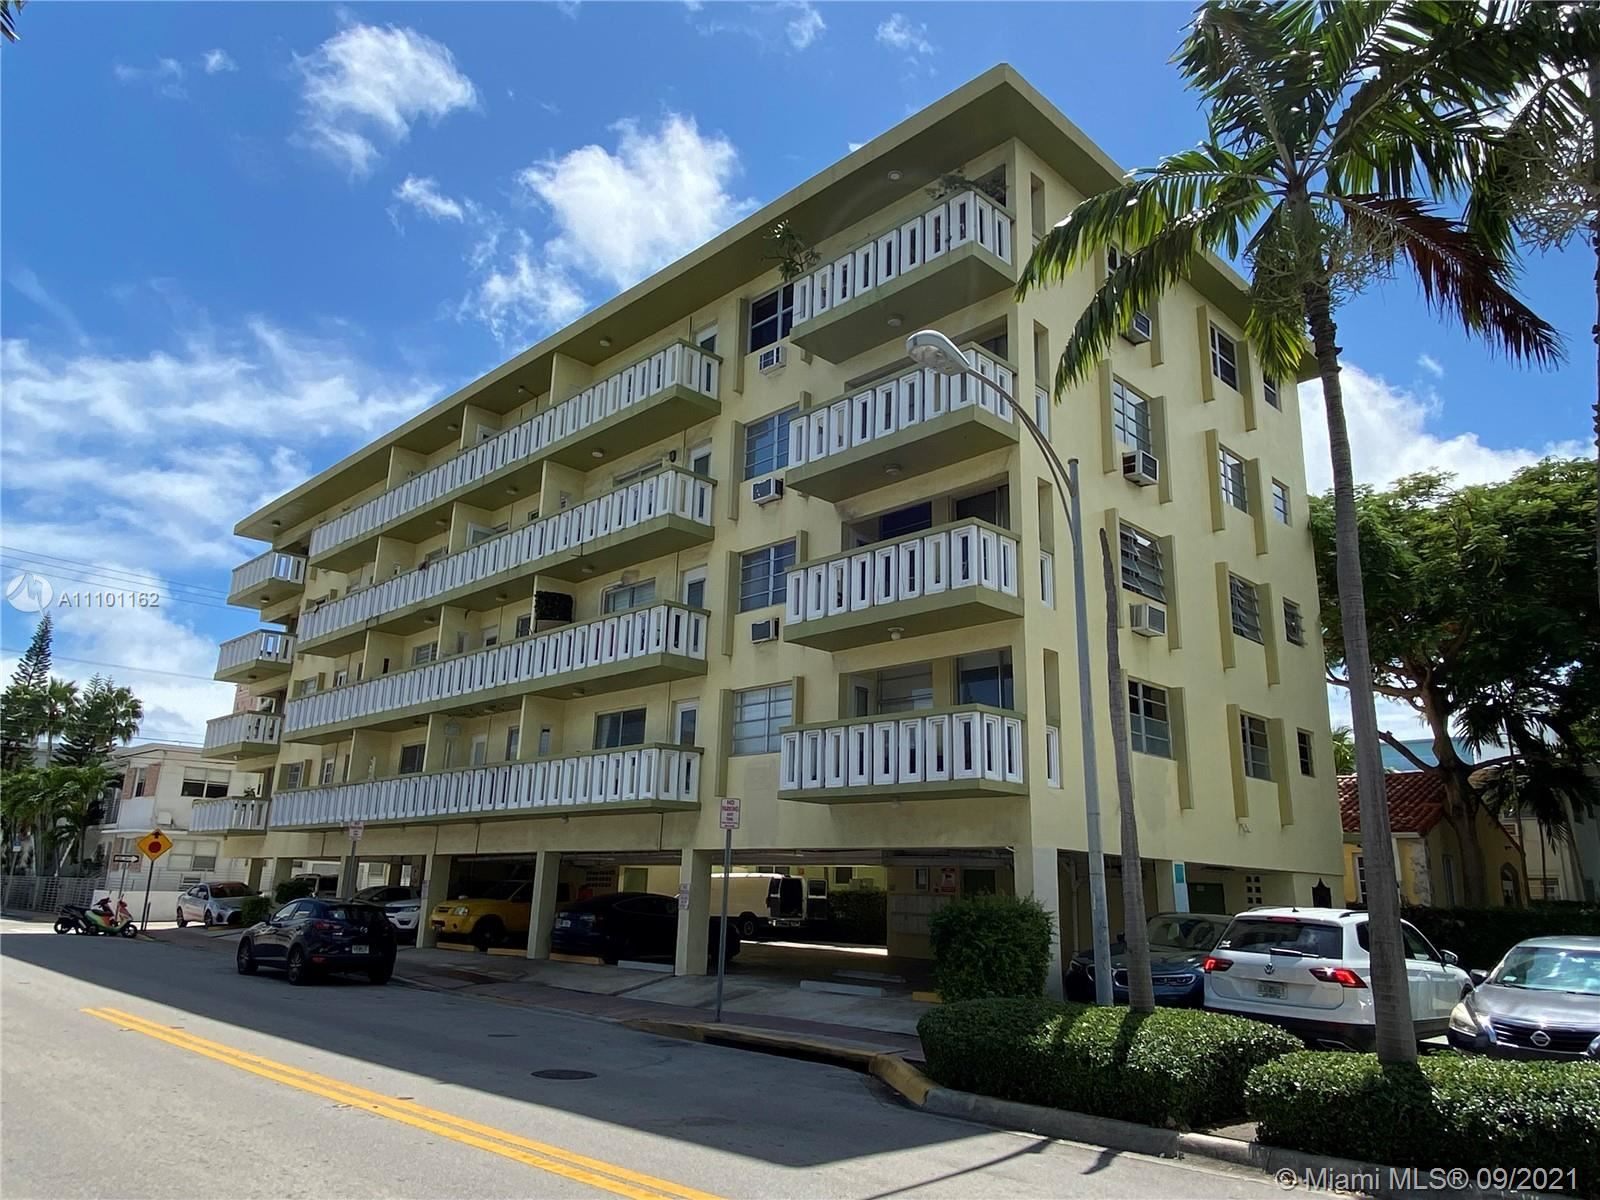 851 Meridian Ave #55, Miami Beach, FL 33139 - #: A11101162